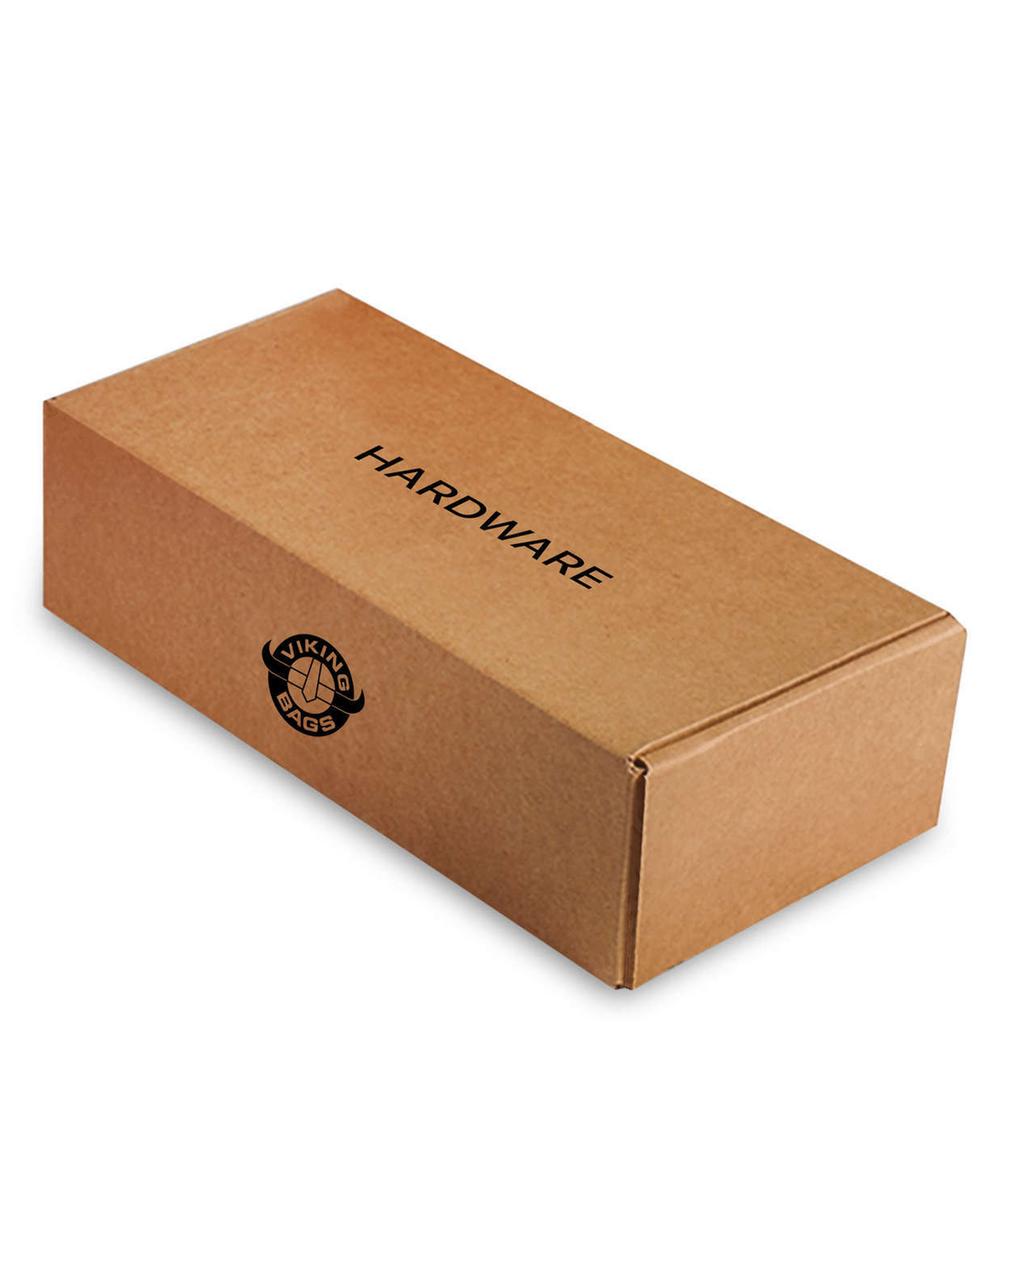 Triumph Thunderbird Shock Cutout Studded Motorcycle Saddlebags Box